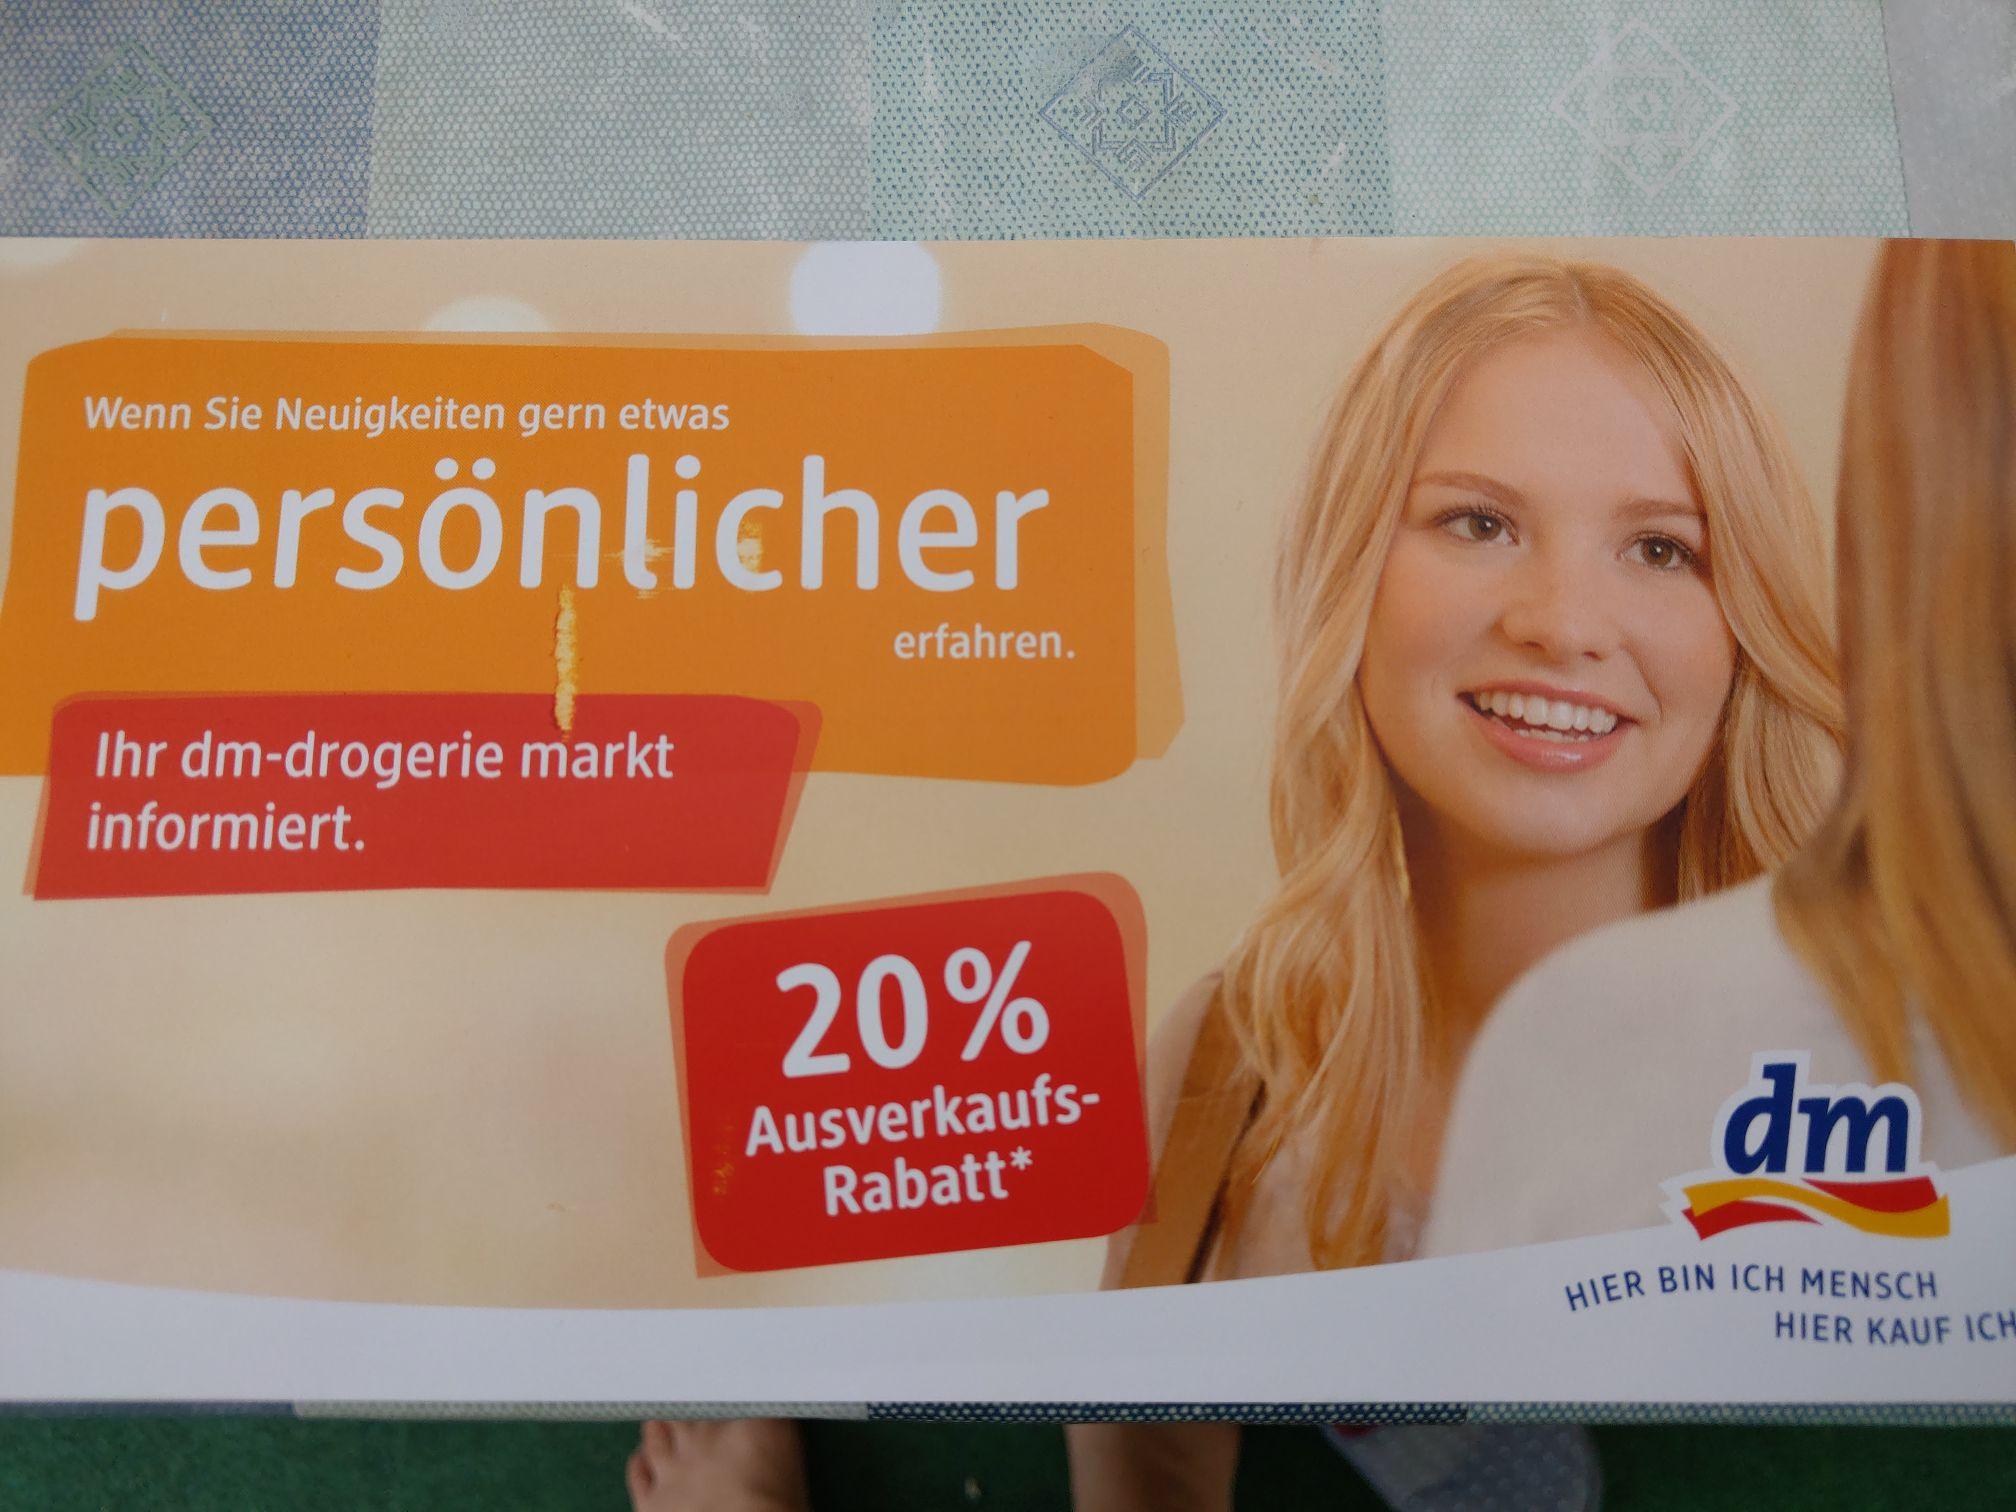 Lokal 75417 Mühlacker - dm 20% Ausverkaufsrabatt